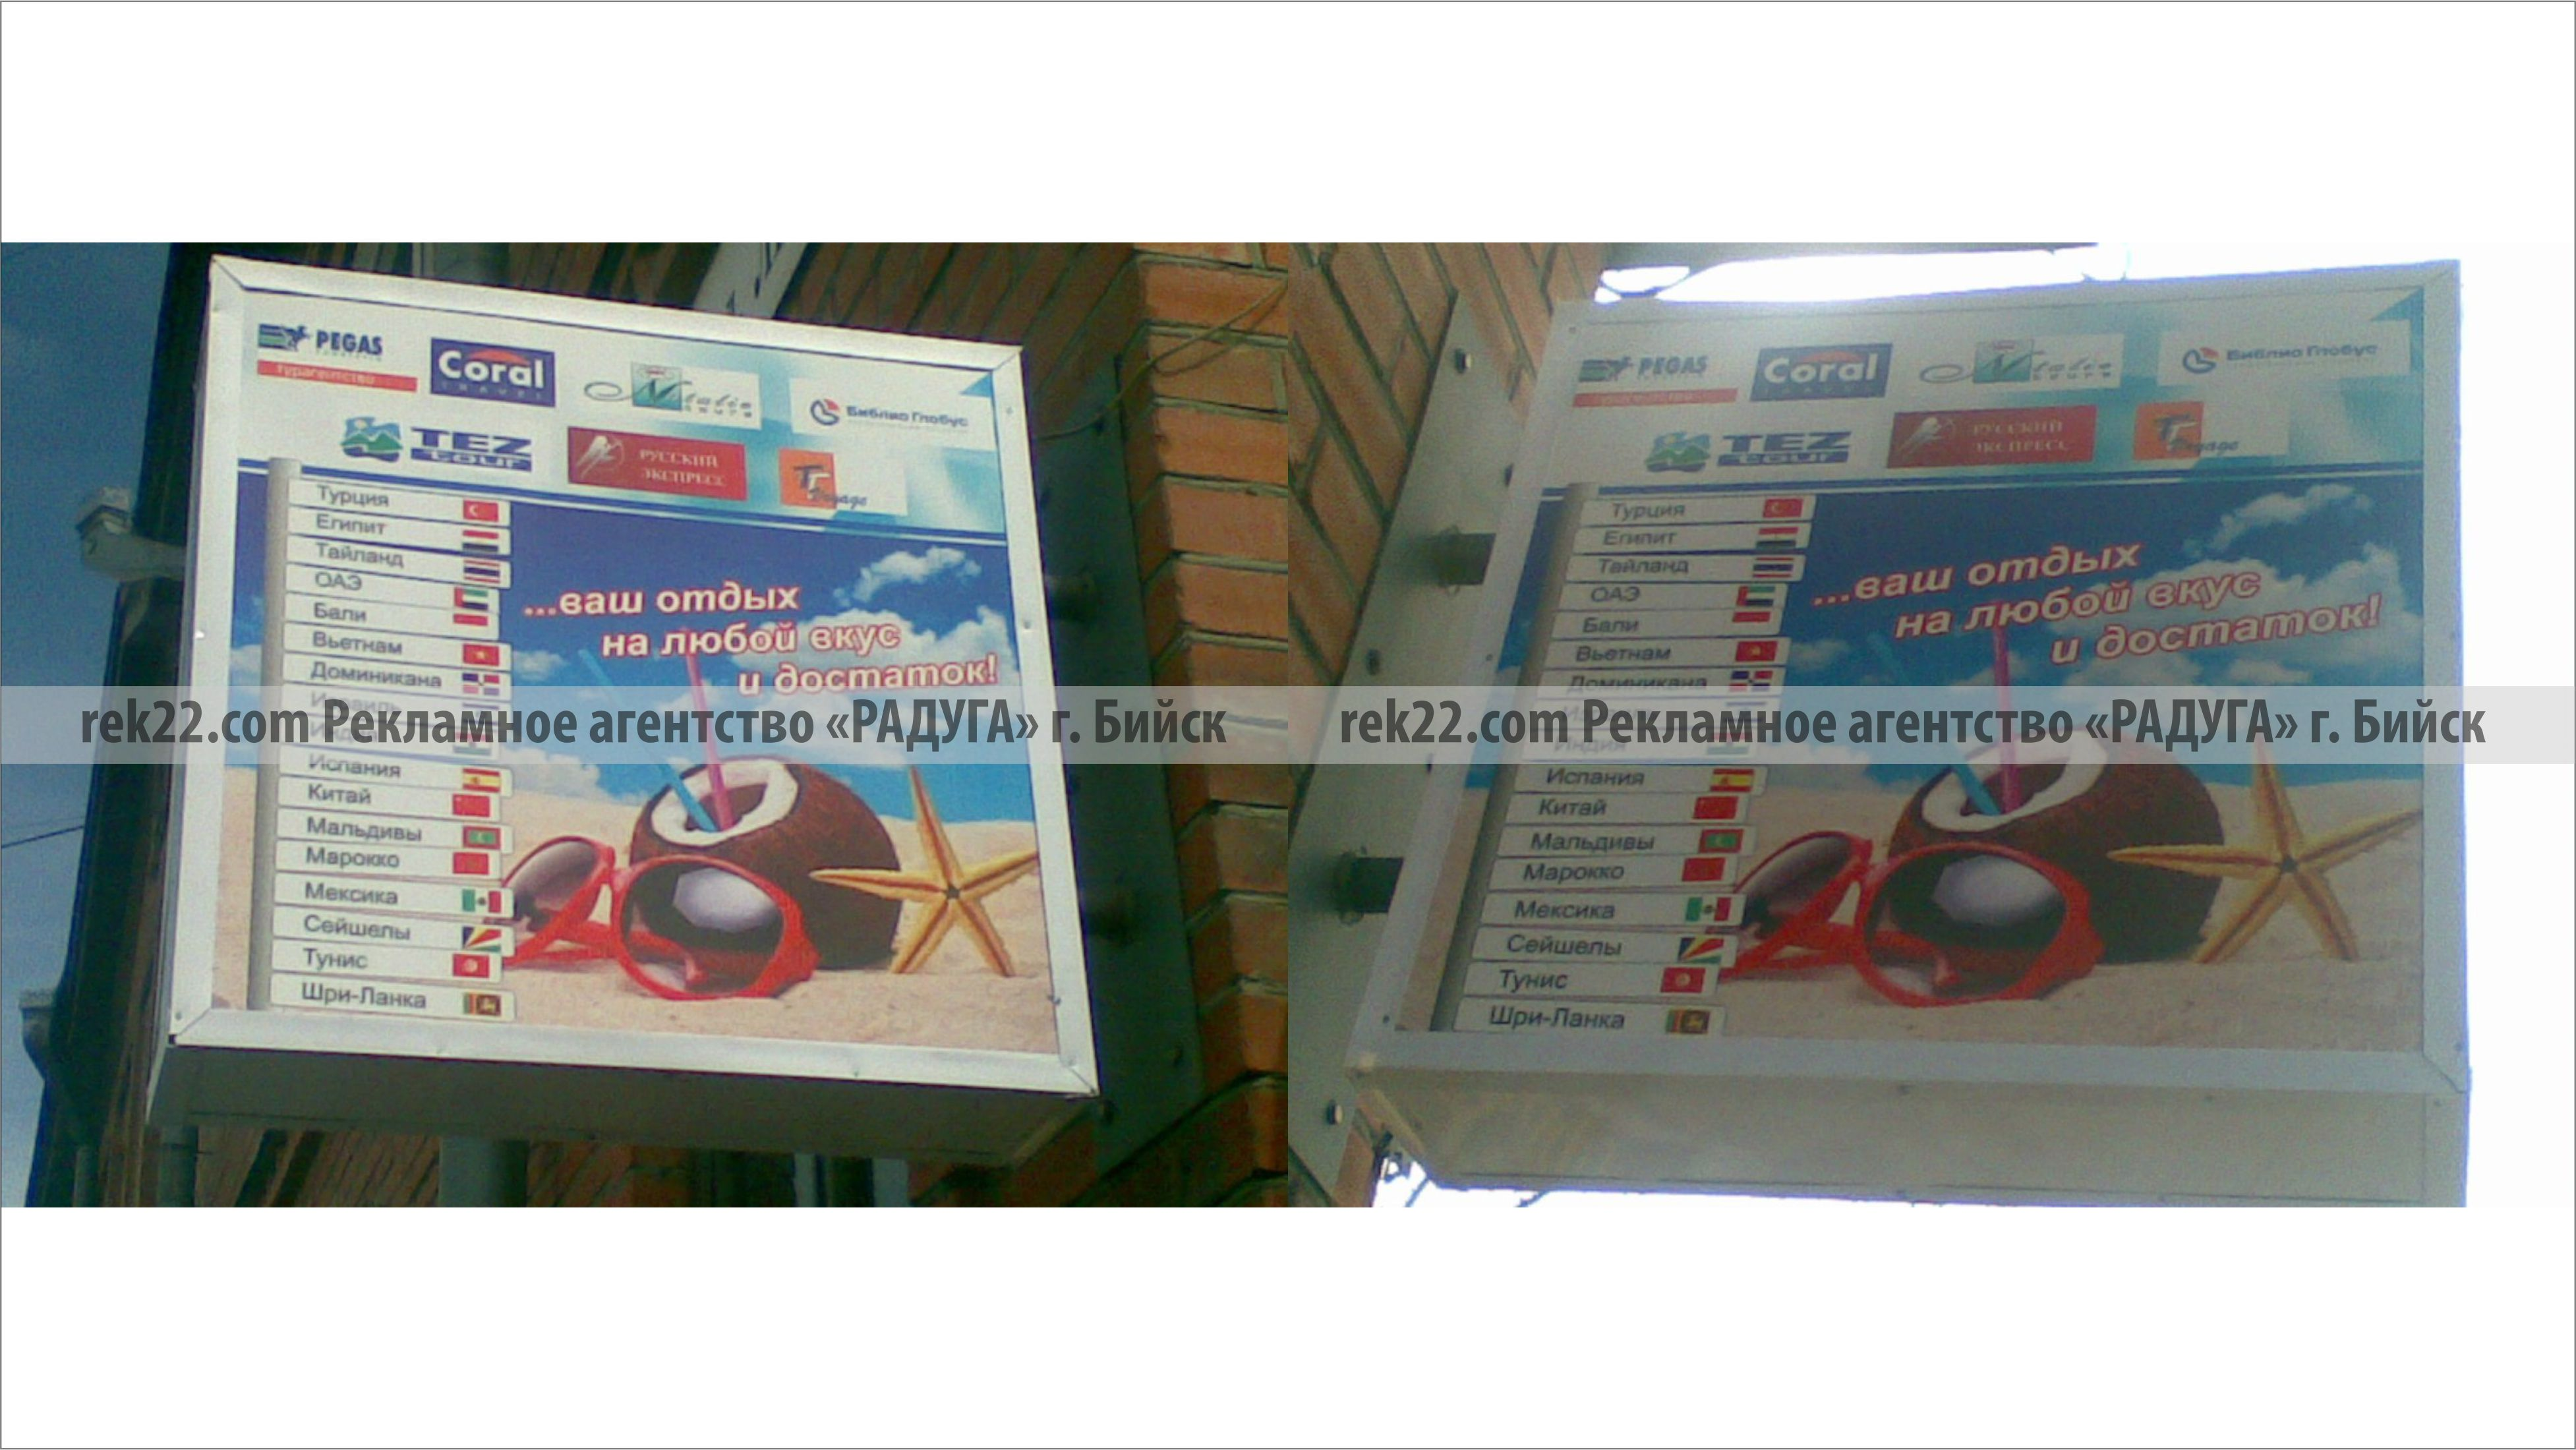 Реклама на транспорте Бийск - вывески, баннера, ПВХ - 3